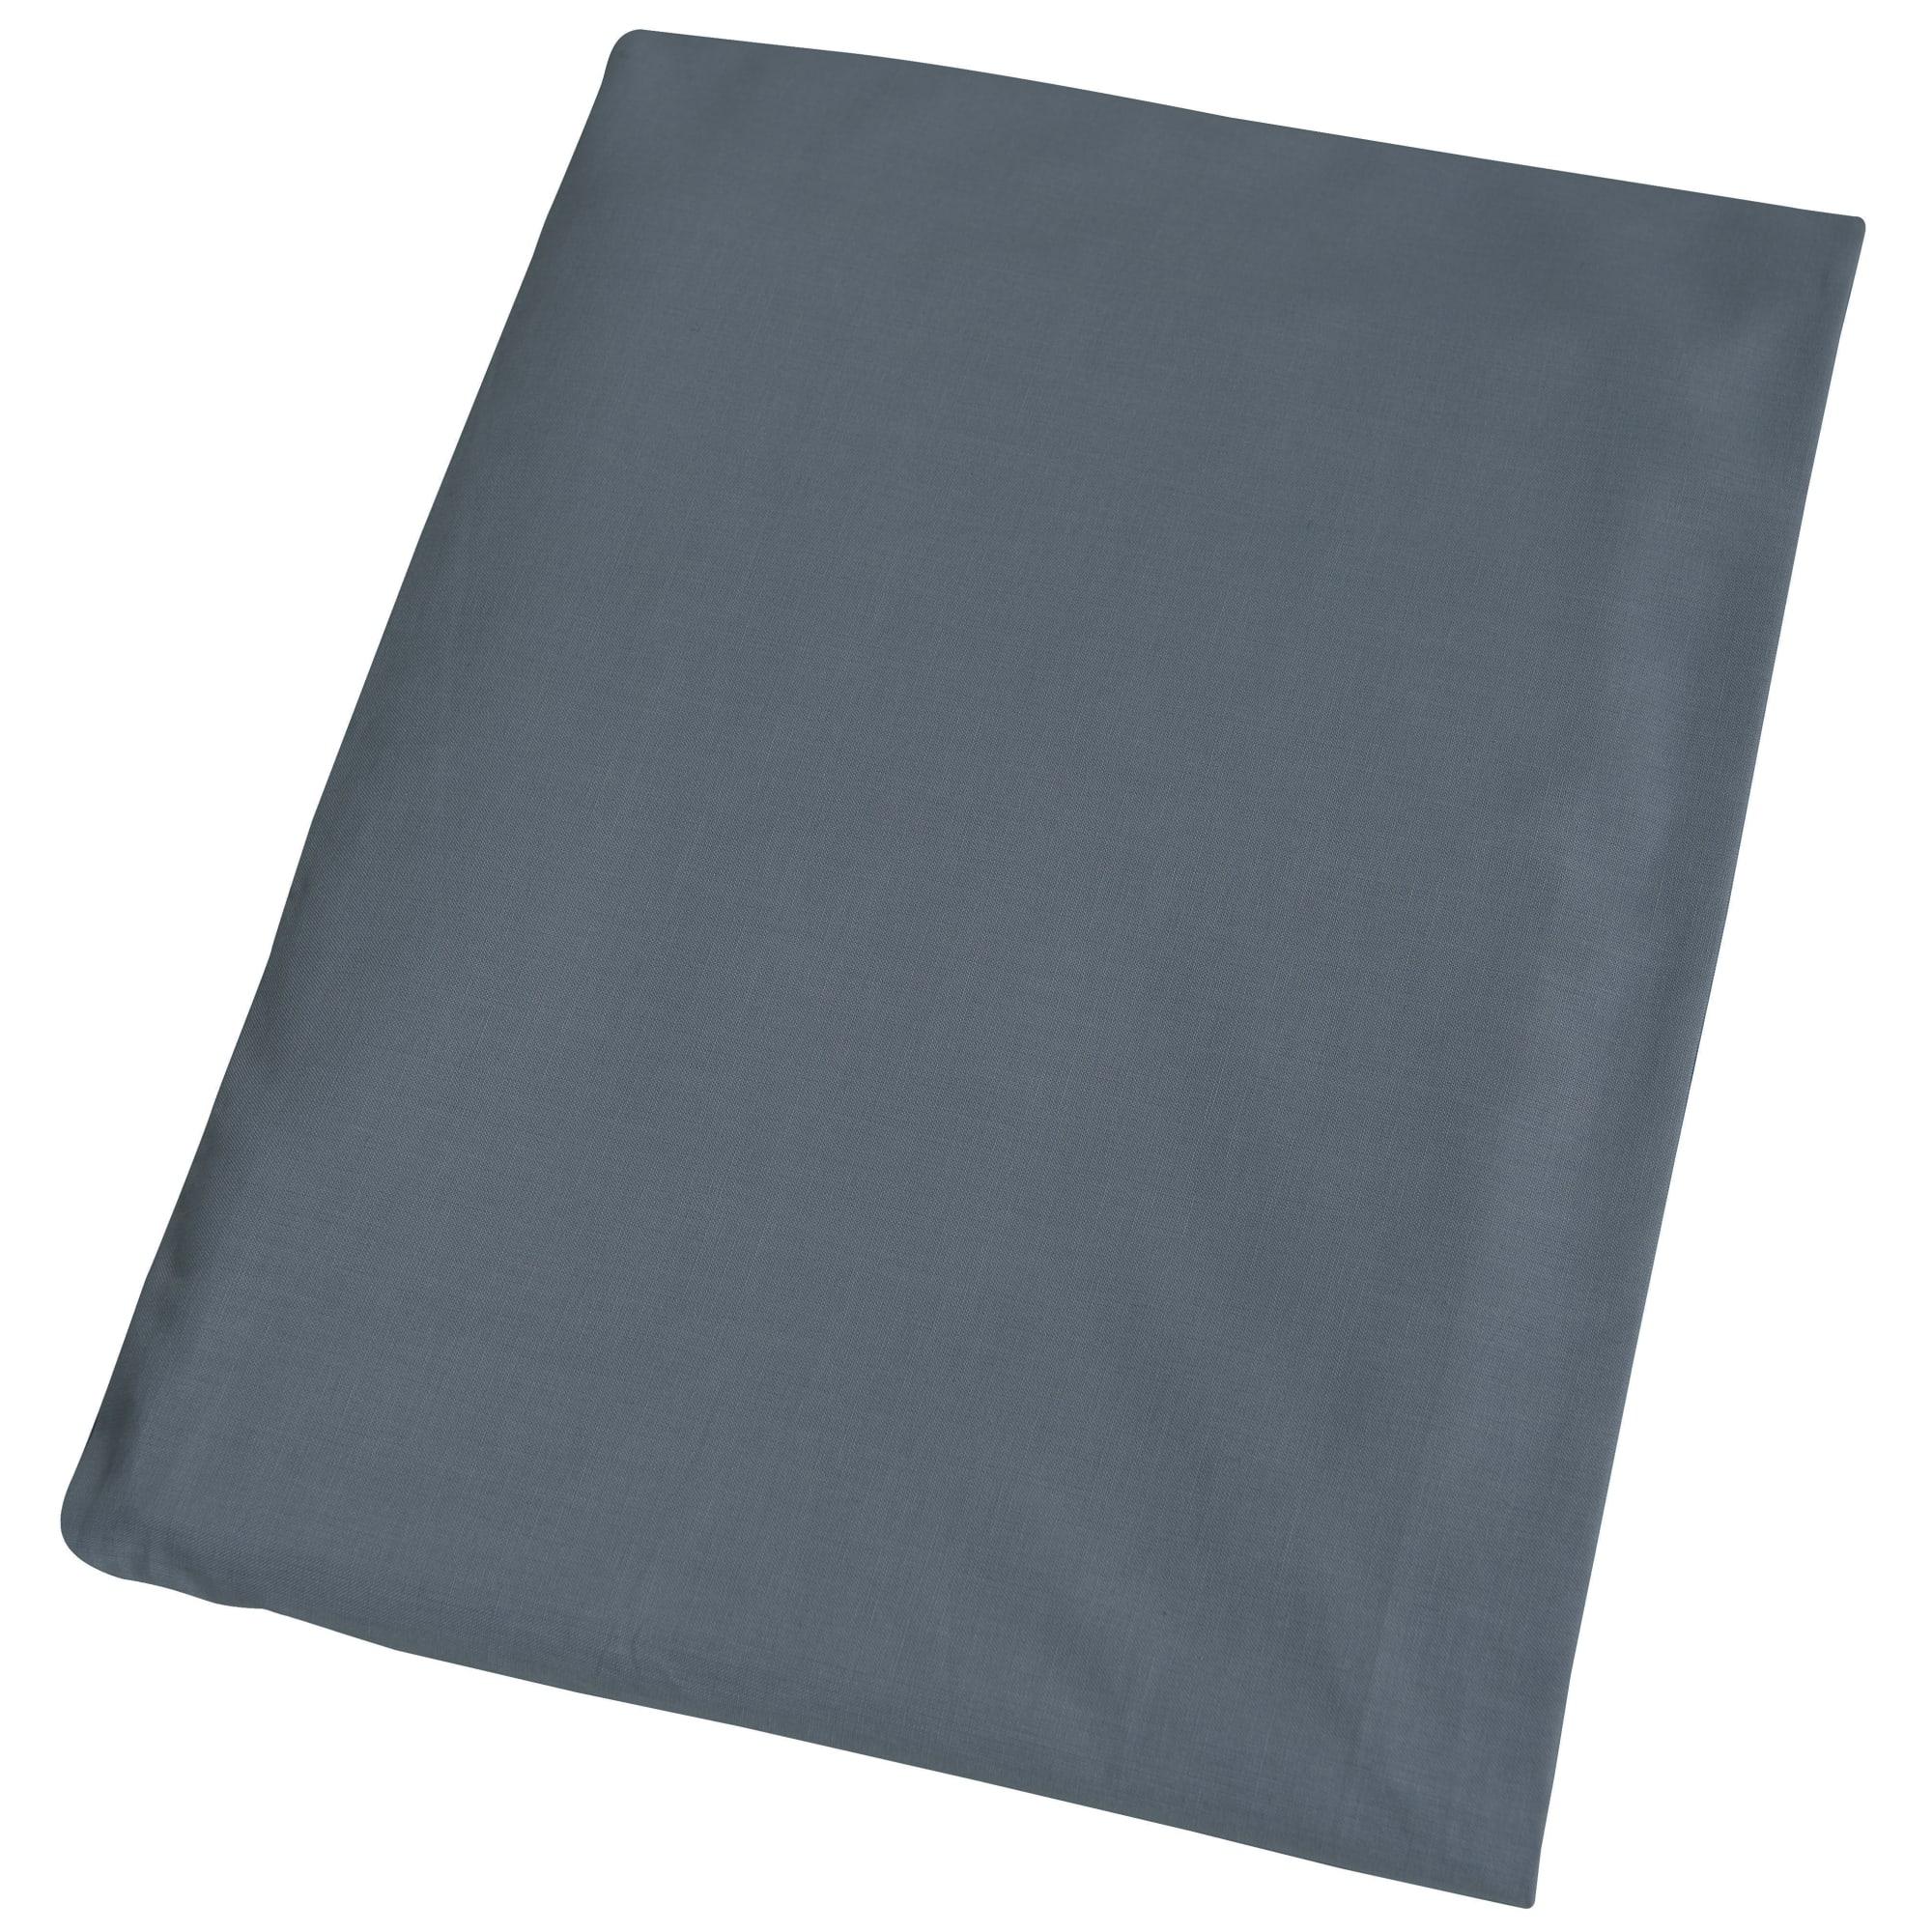 Bomuld/elastan - 180 x 200 x 27 cm